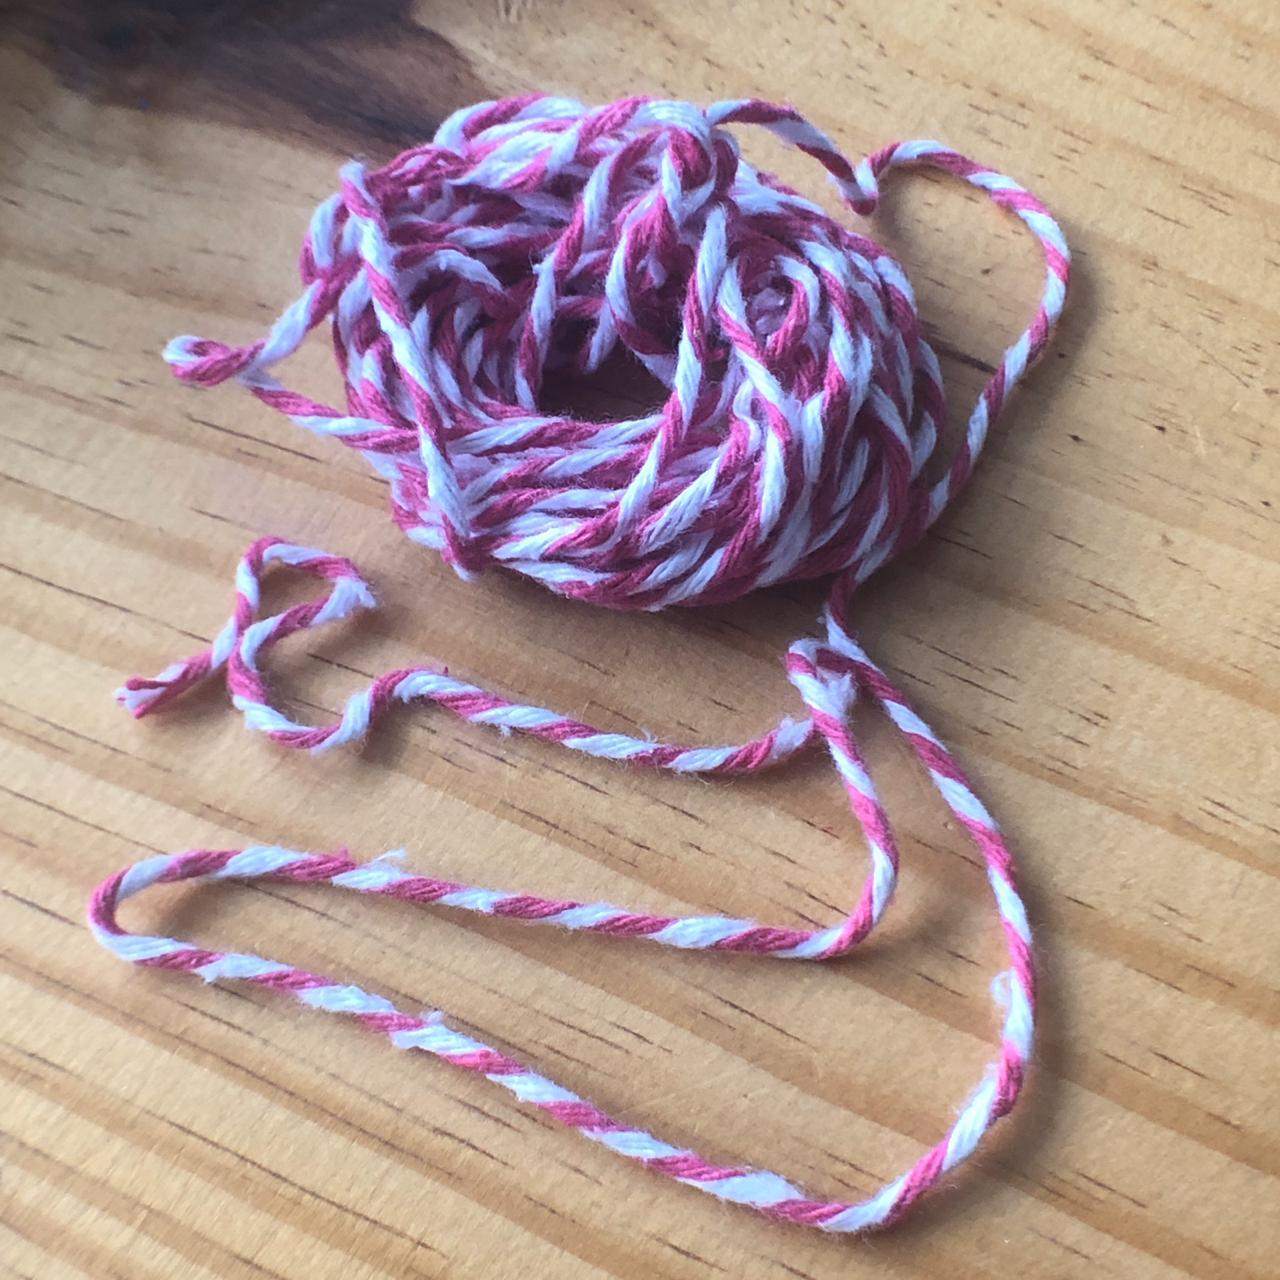 Barbante Bake Twine - Rosa com Branco (BBT005)